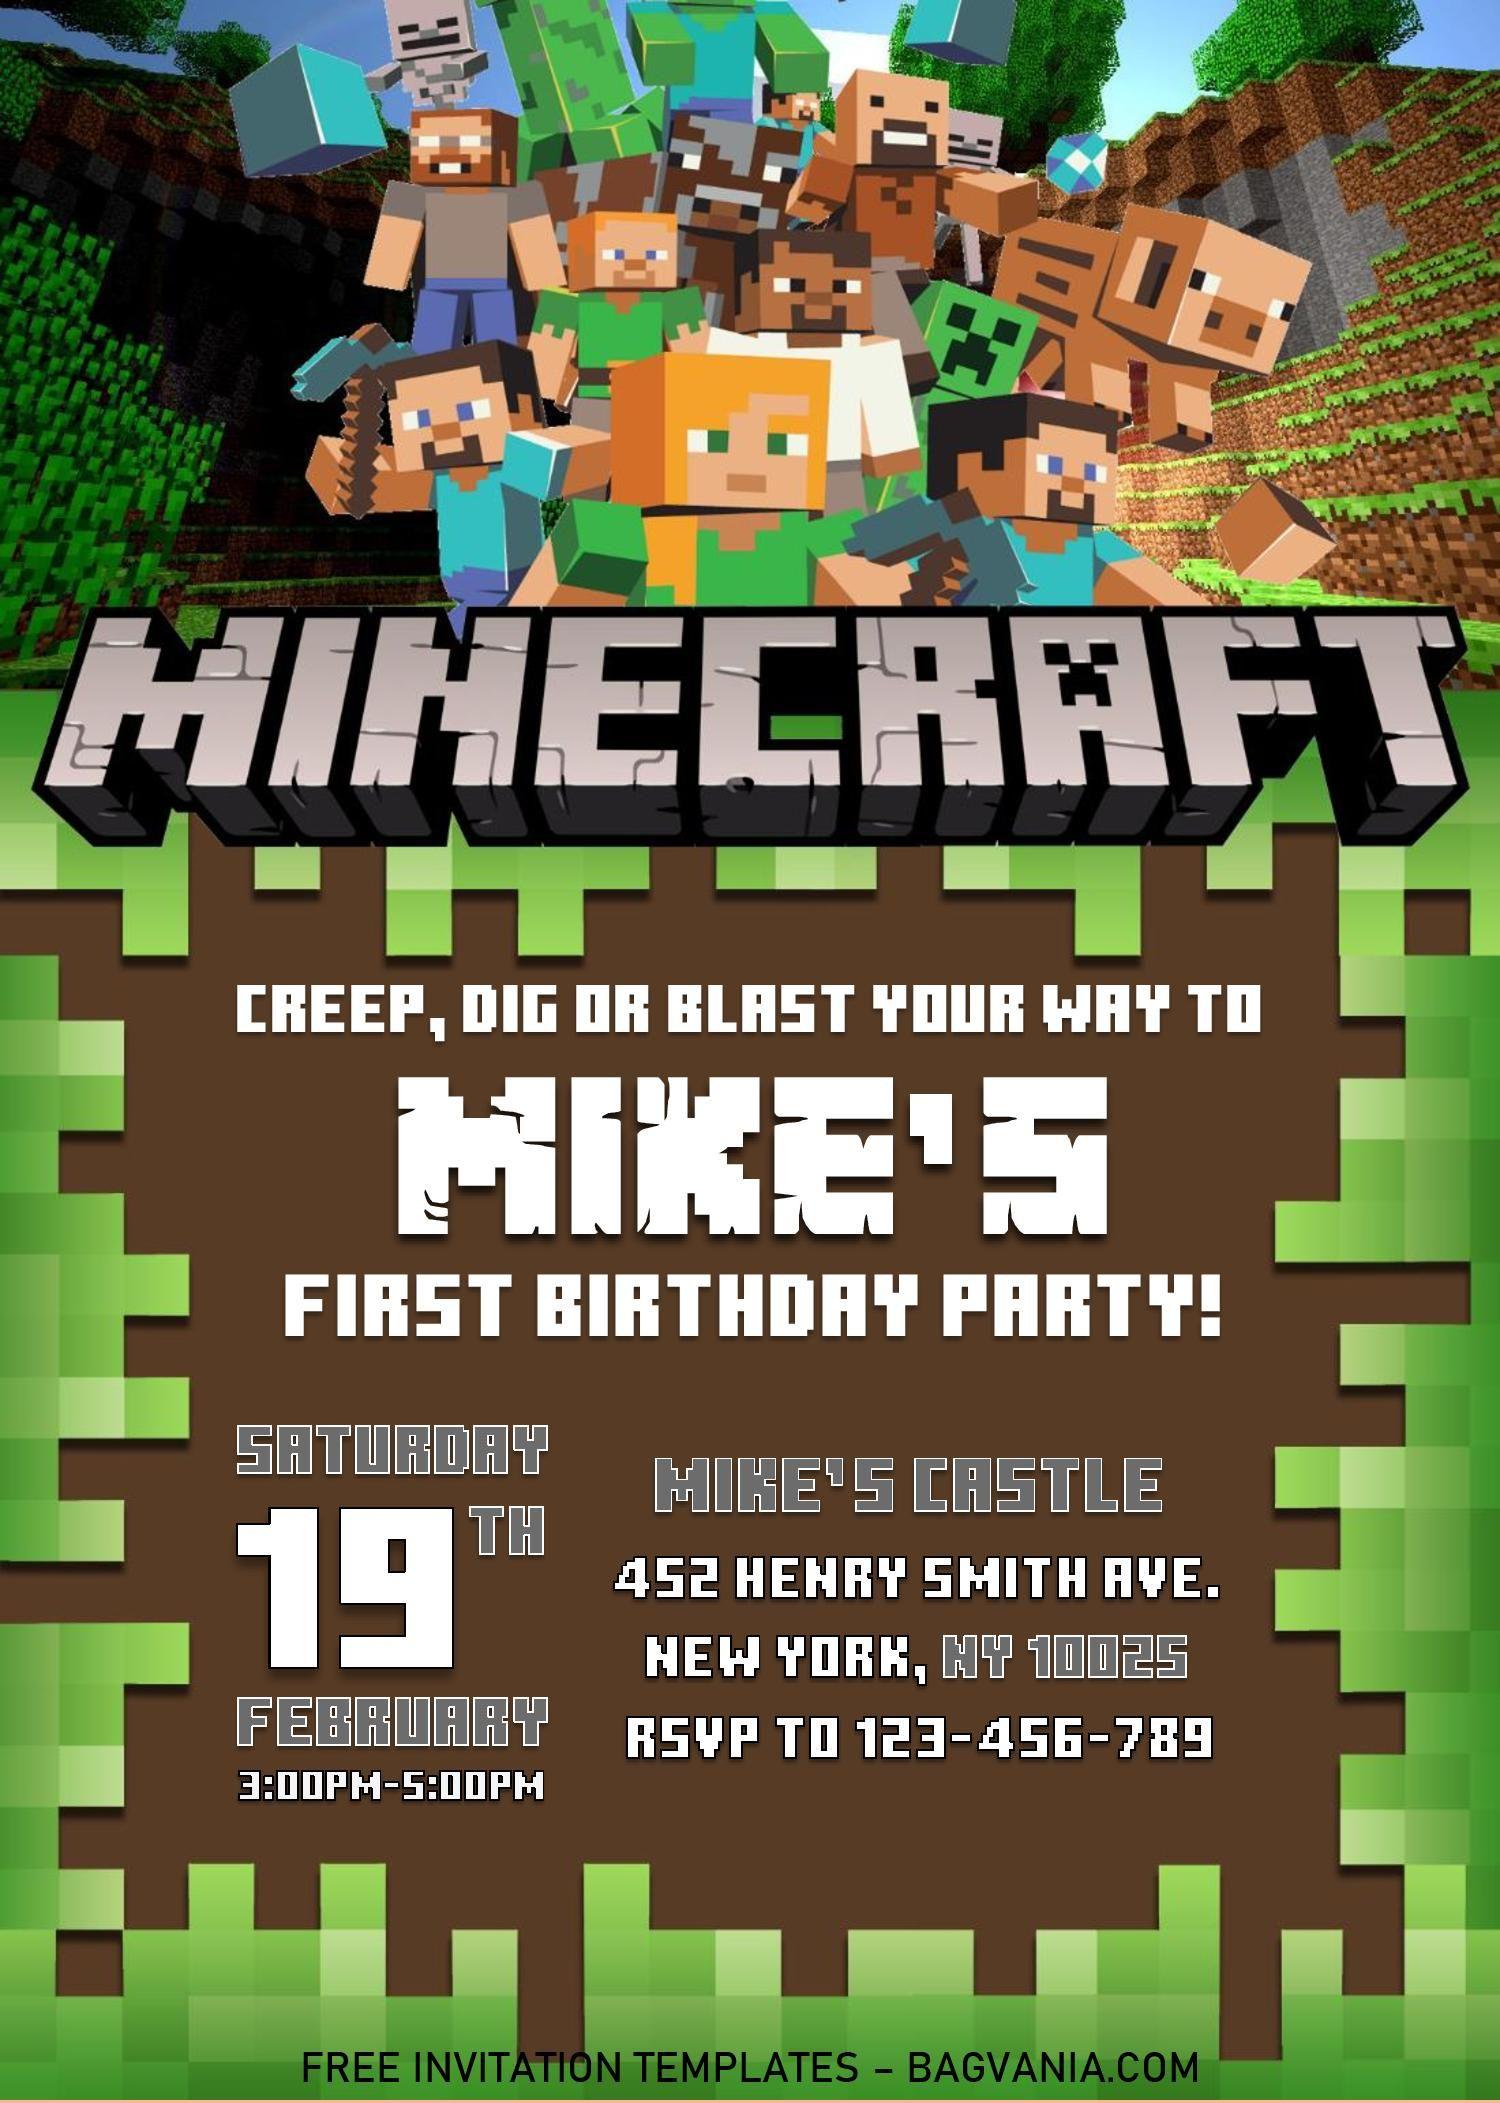 Minecraft Birthday Invitation Templates Editable With Ms Word Minecraft Birthday Invitations Minecraft Birthday Minecraft Party Invitations Minecraft birthday invitation template free